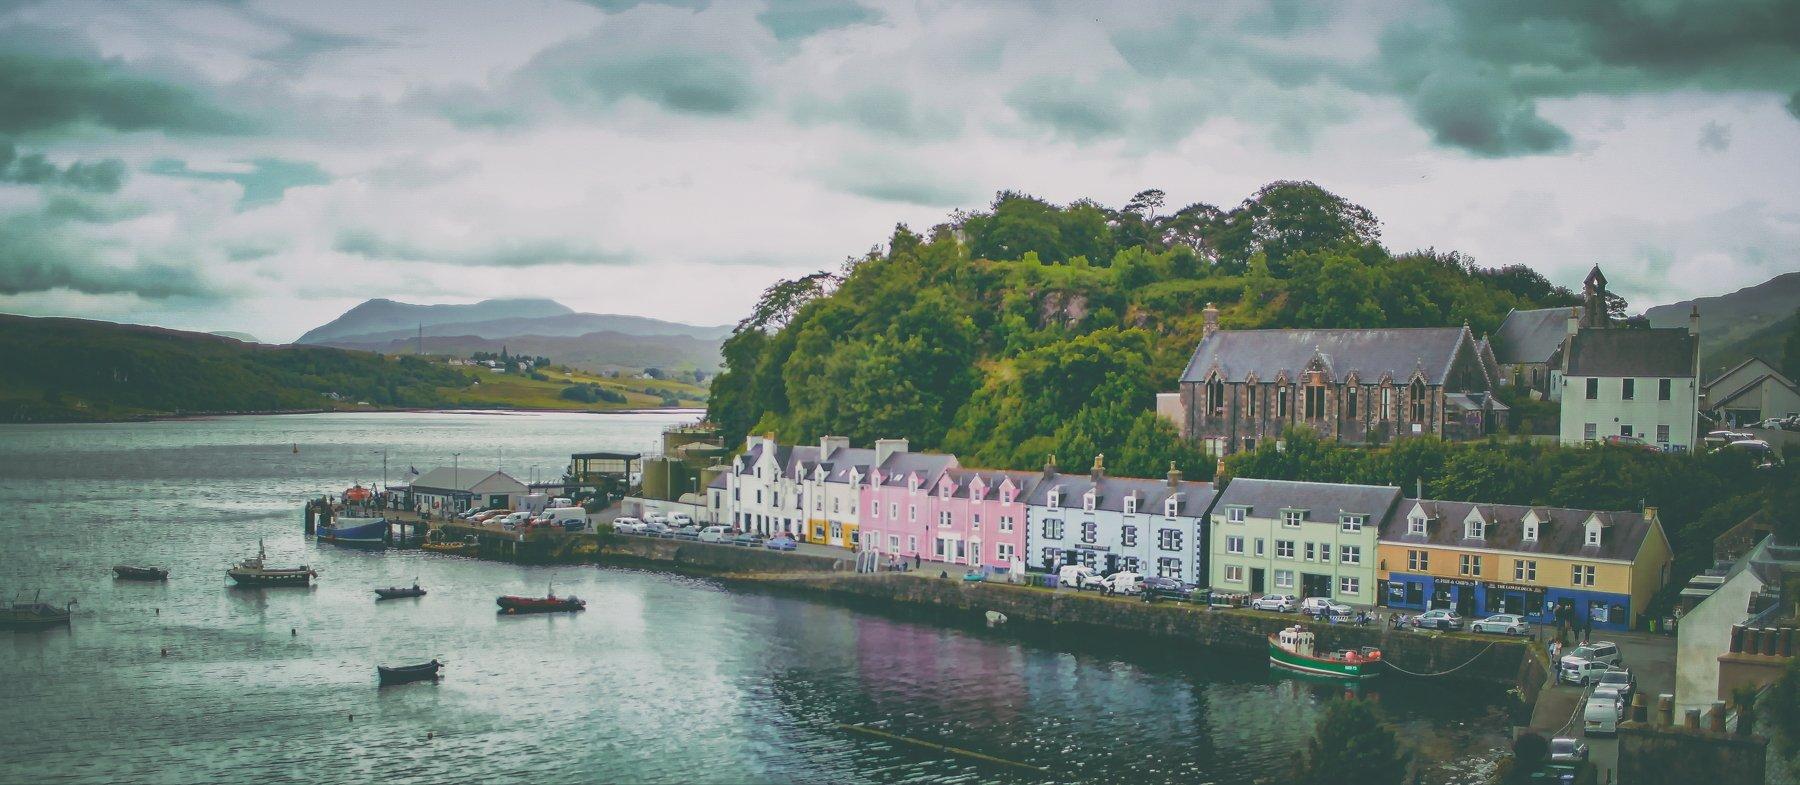 Portree evening. Scotland.Isle of Skye, Lilia Tkachenko